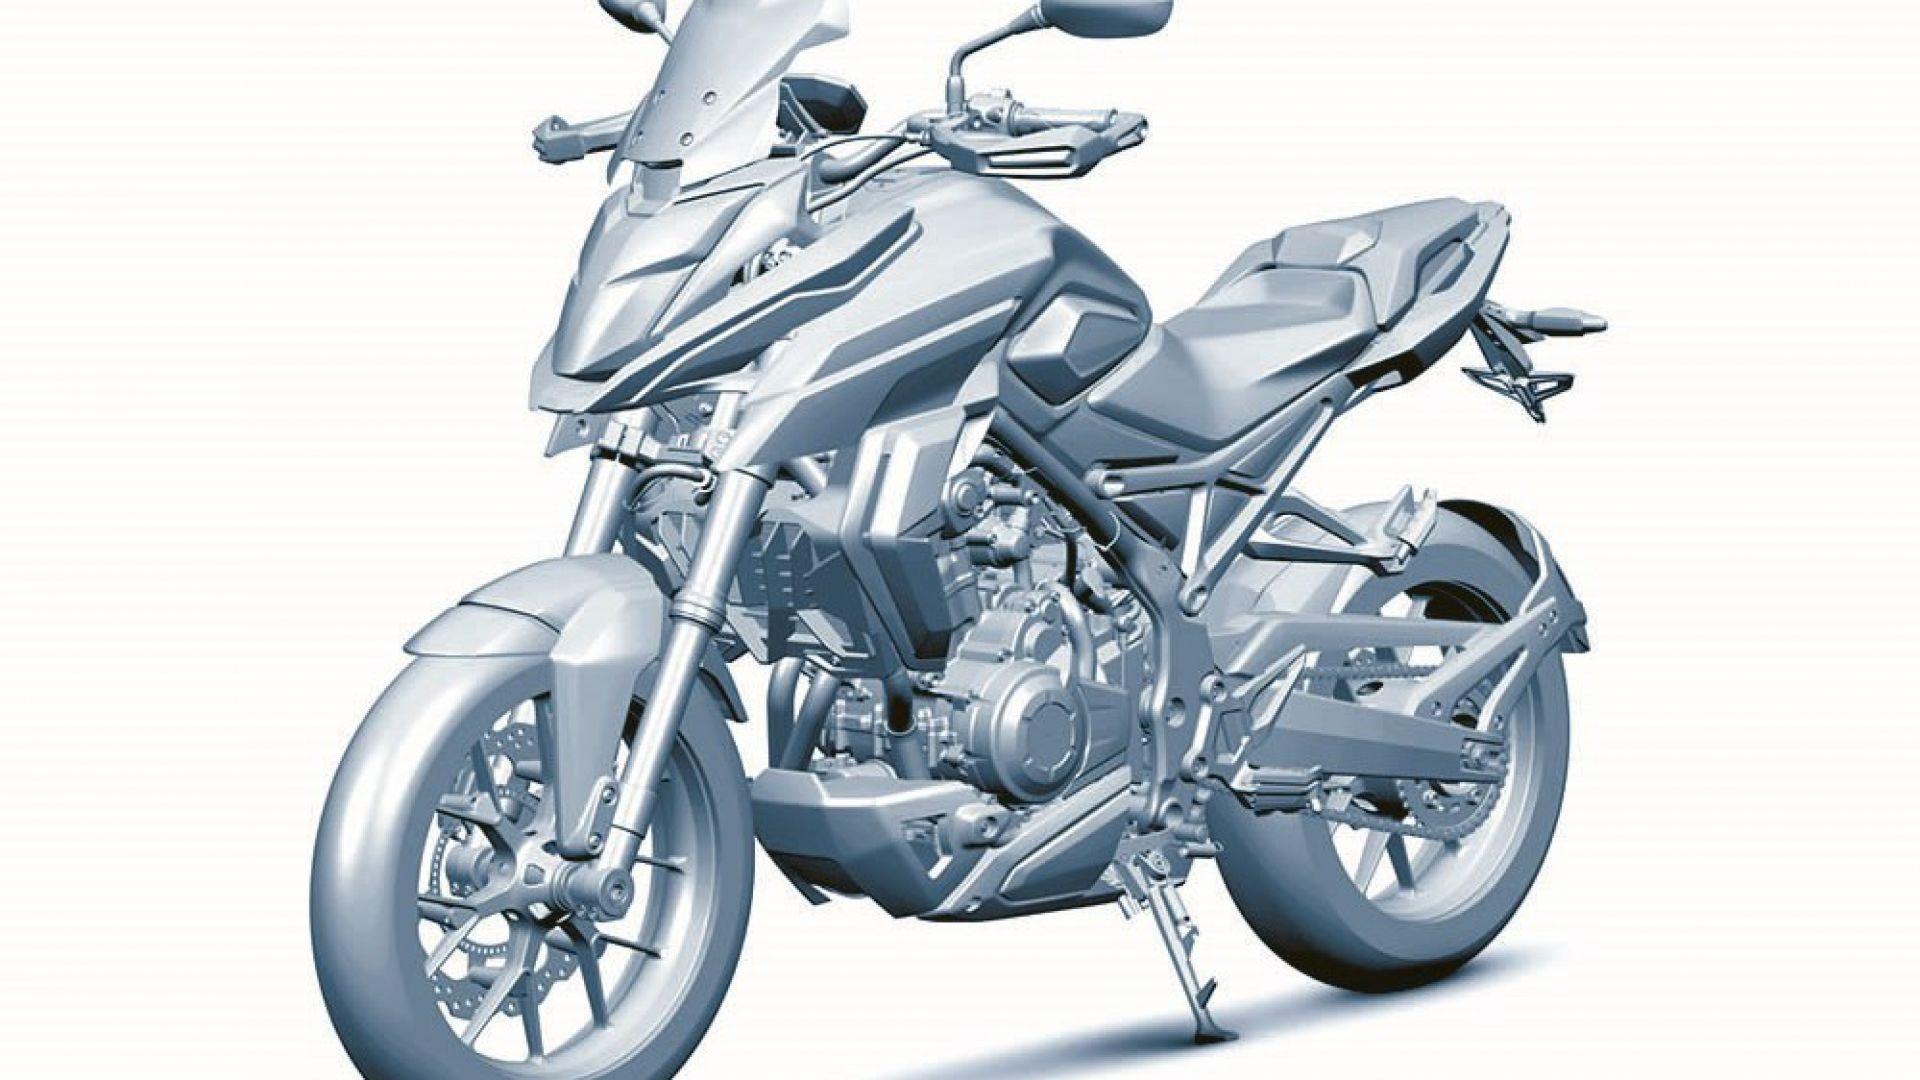 concept bike honda cb500x 2018 sar cos motorbox. Black Bedroom Furniture Sets. Home Design Ideas